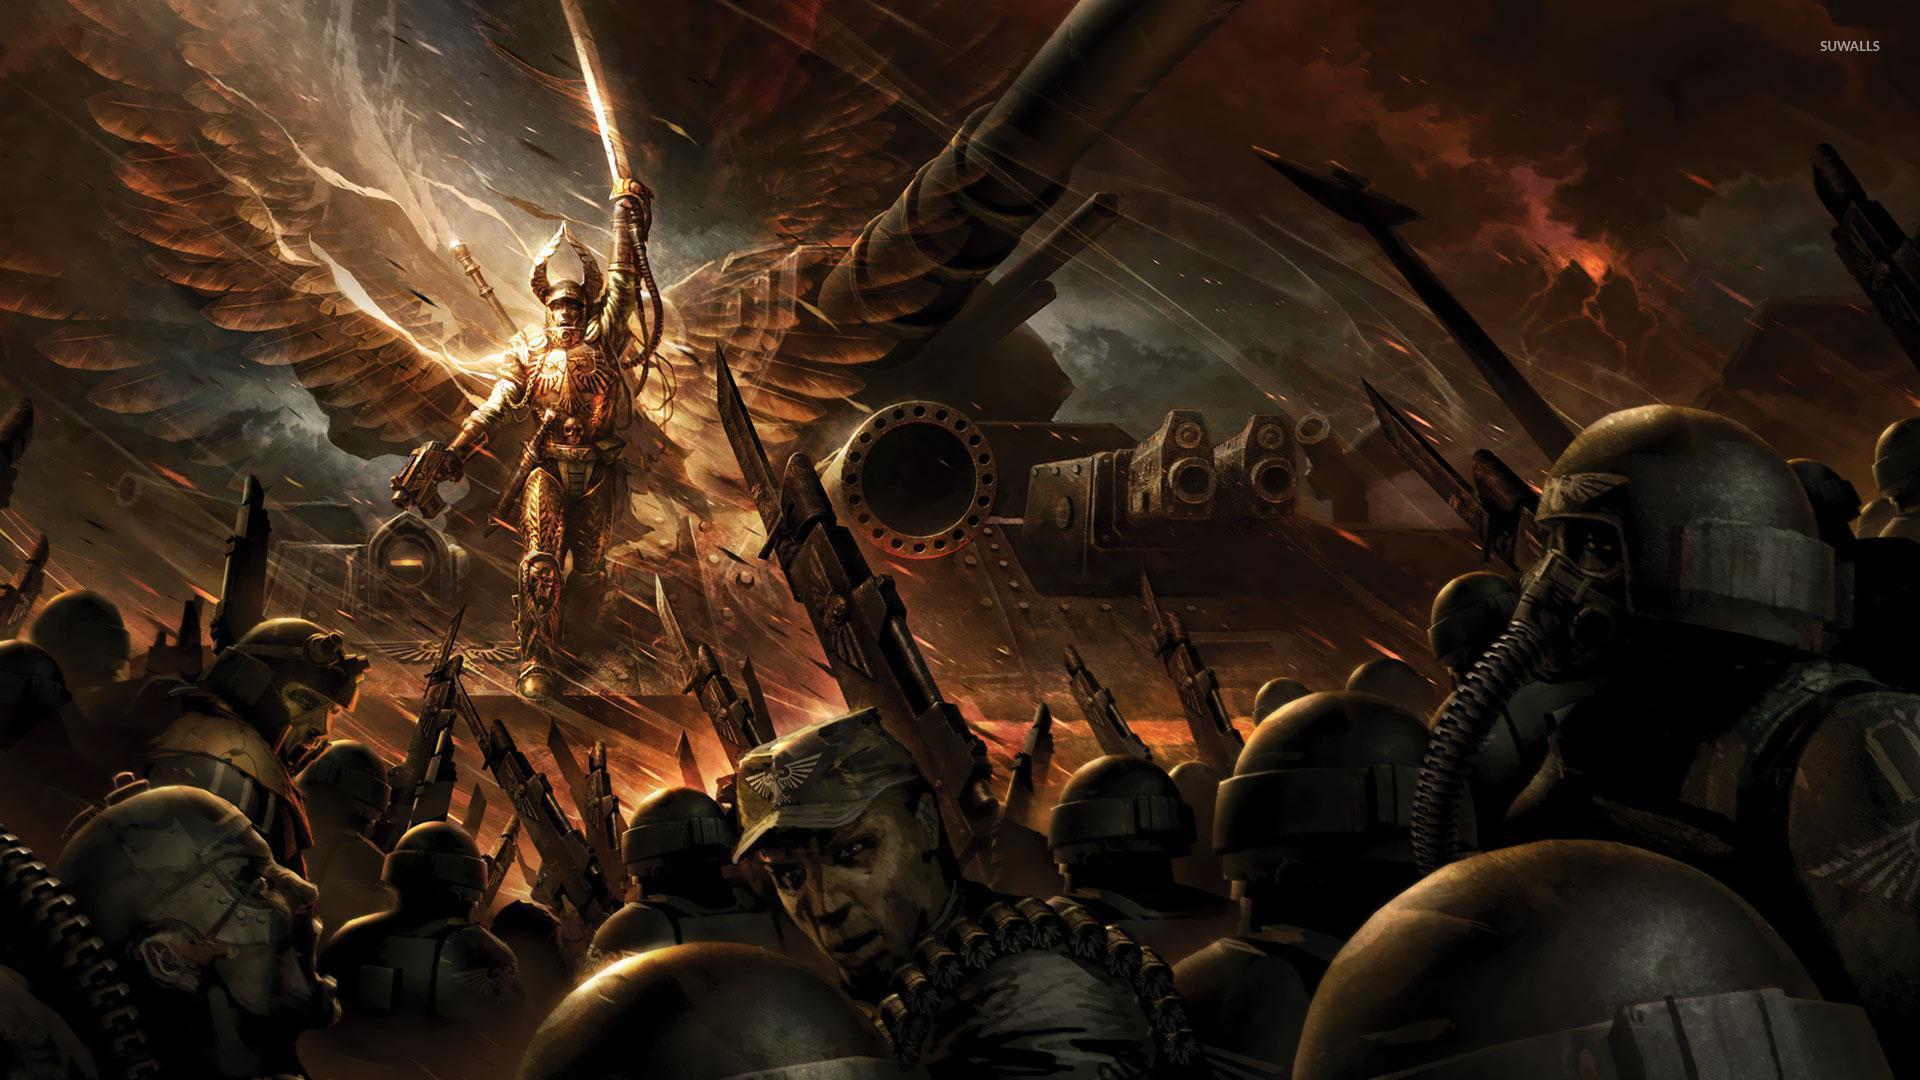 Warhammer Black Templars Wallpaper Game Wallpapers 15565